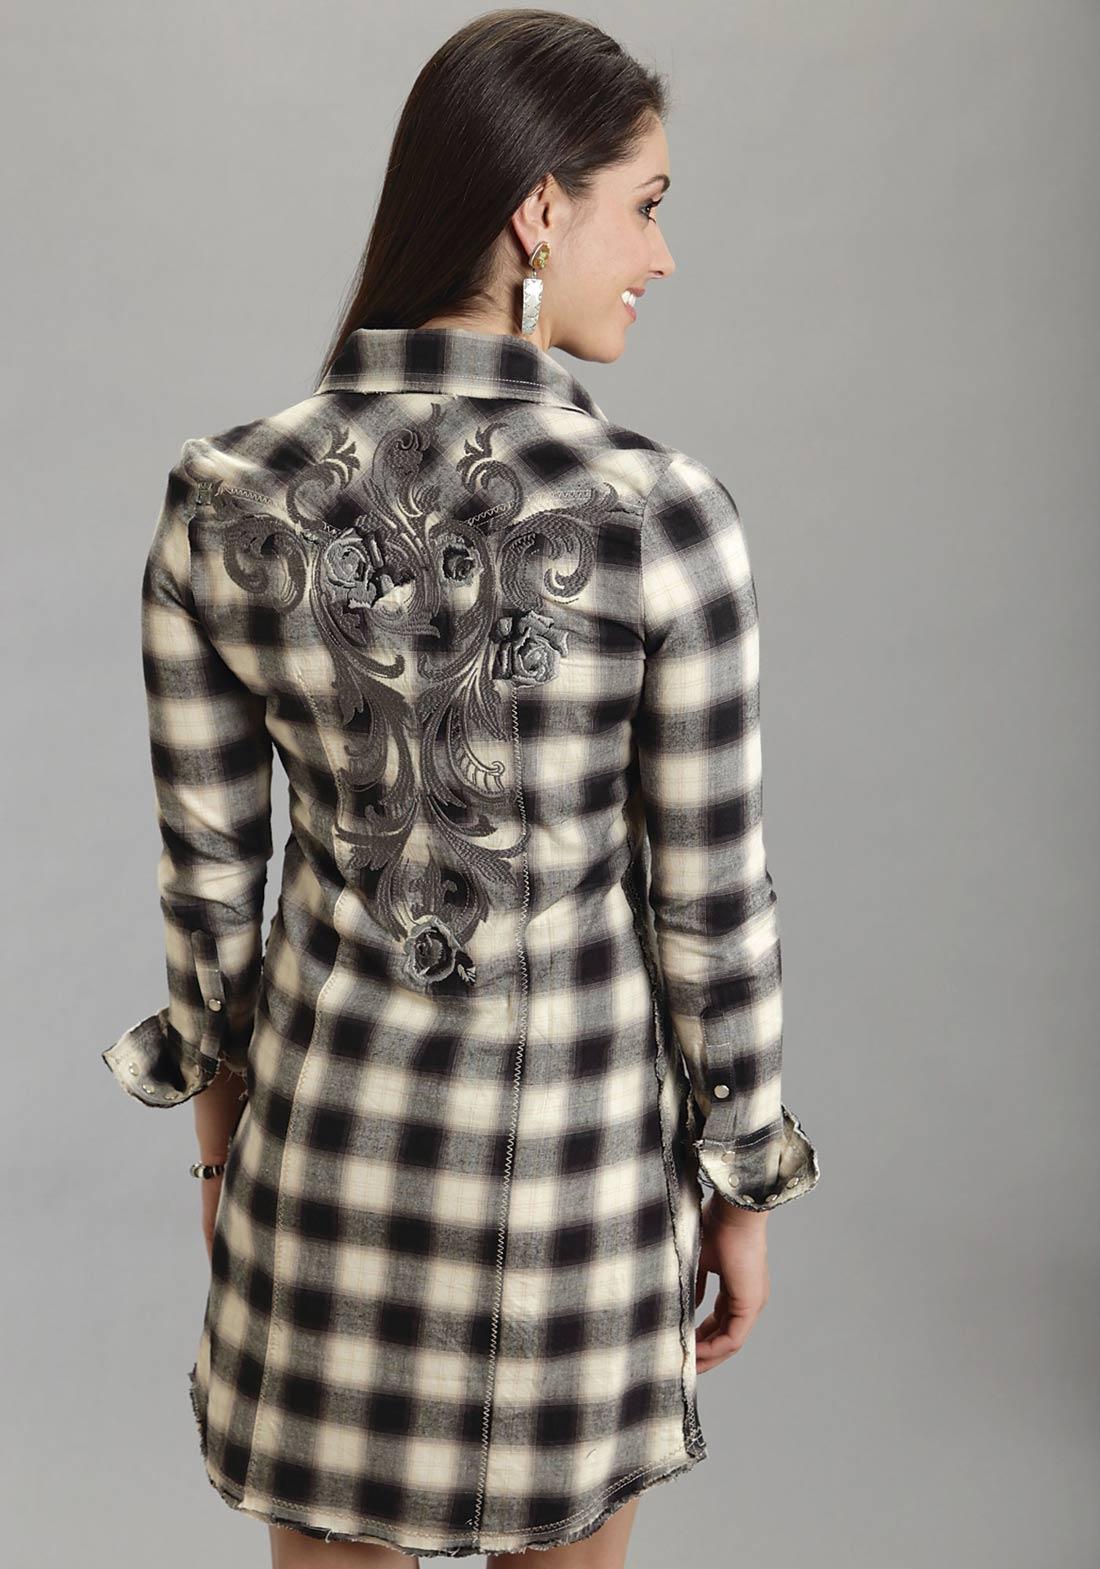 de8b49e8f8 Stetson Women s DECO OMBRE PLAID DRESS